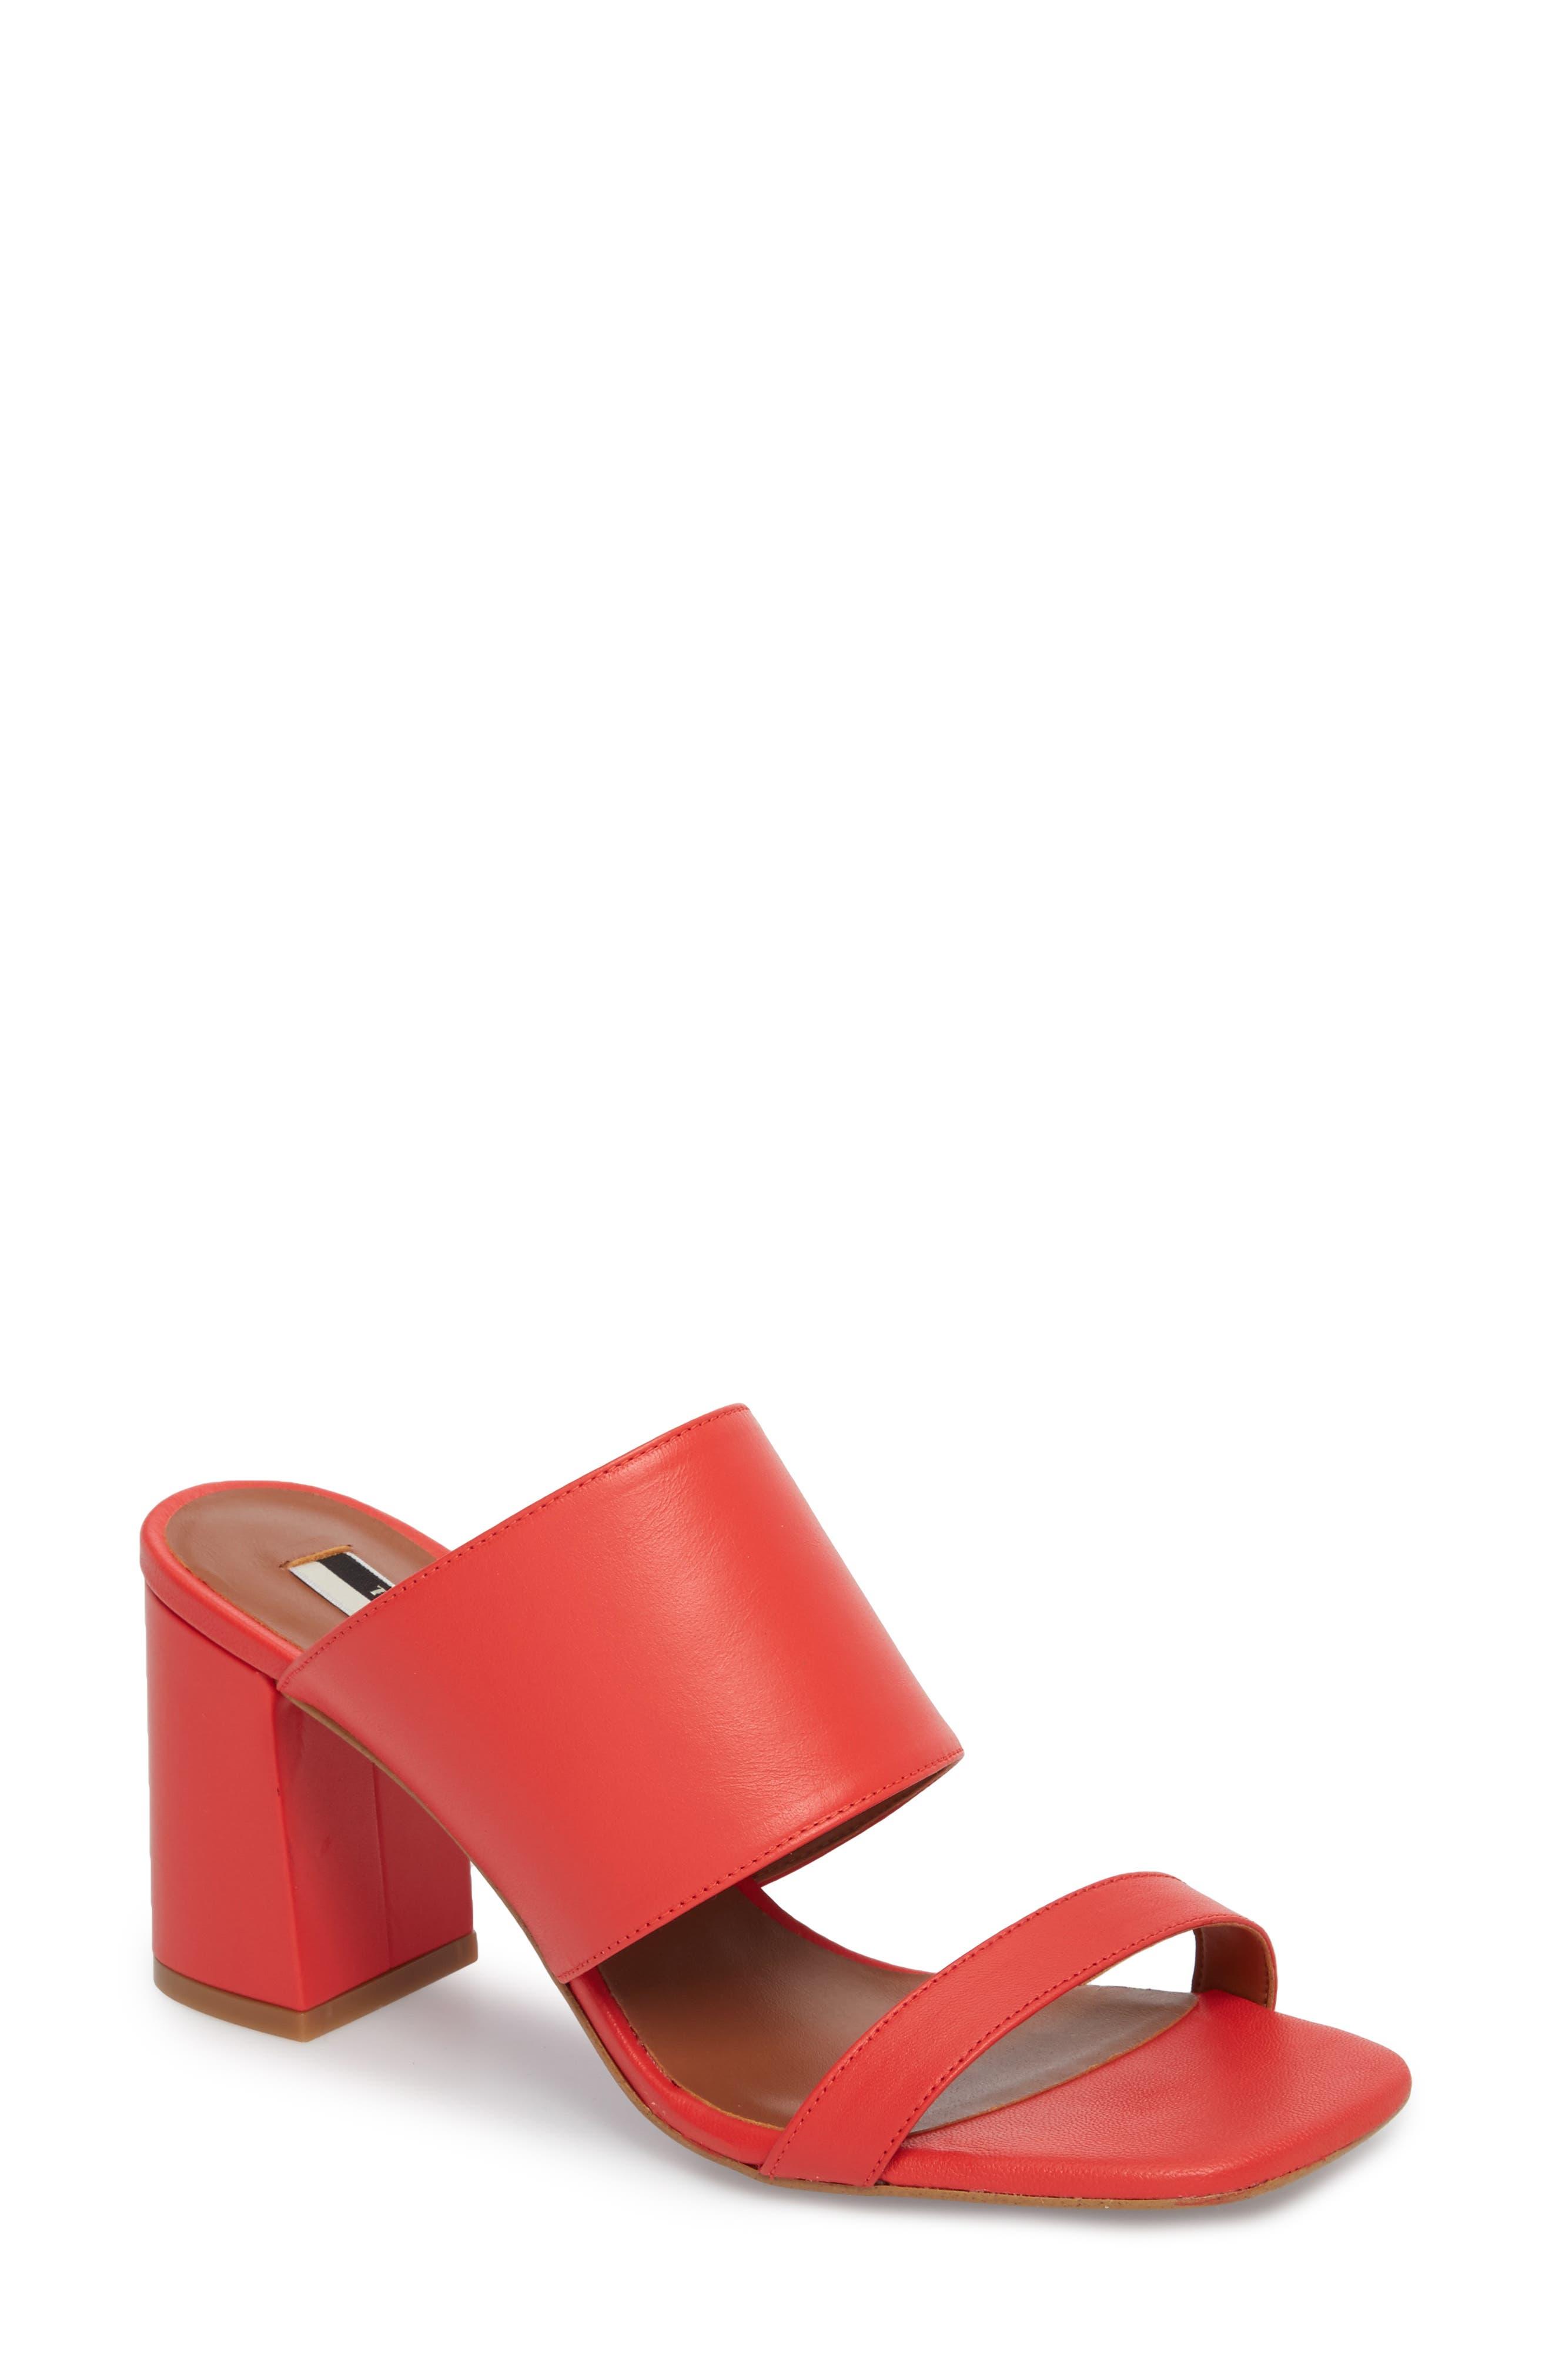 Alternate Image 1 Selected - Topshop Nickle Mule Sandal (Women)